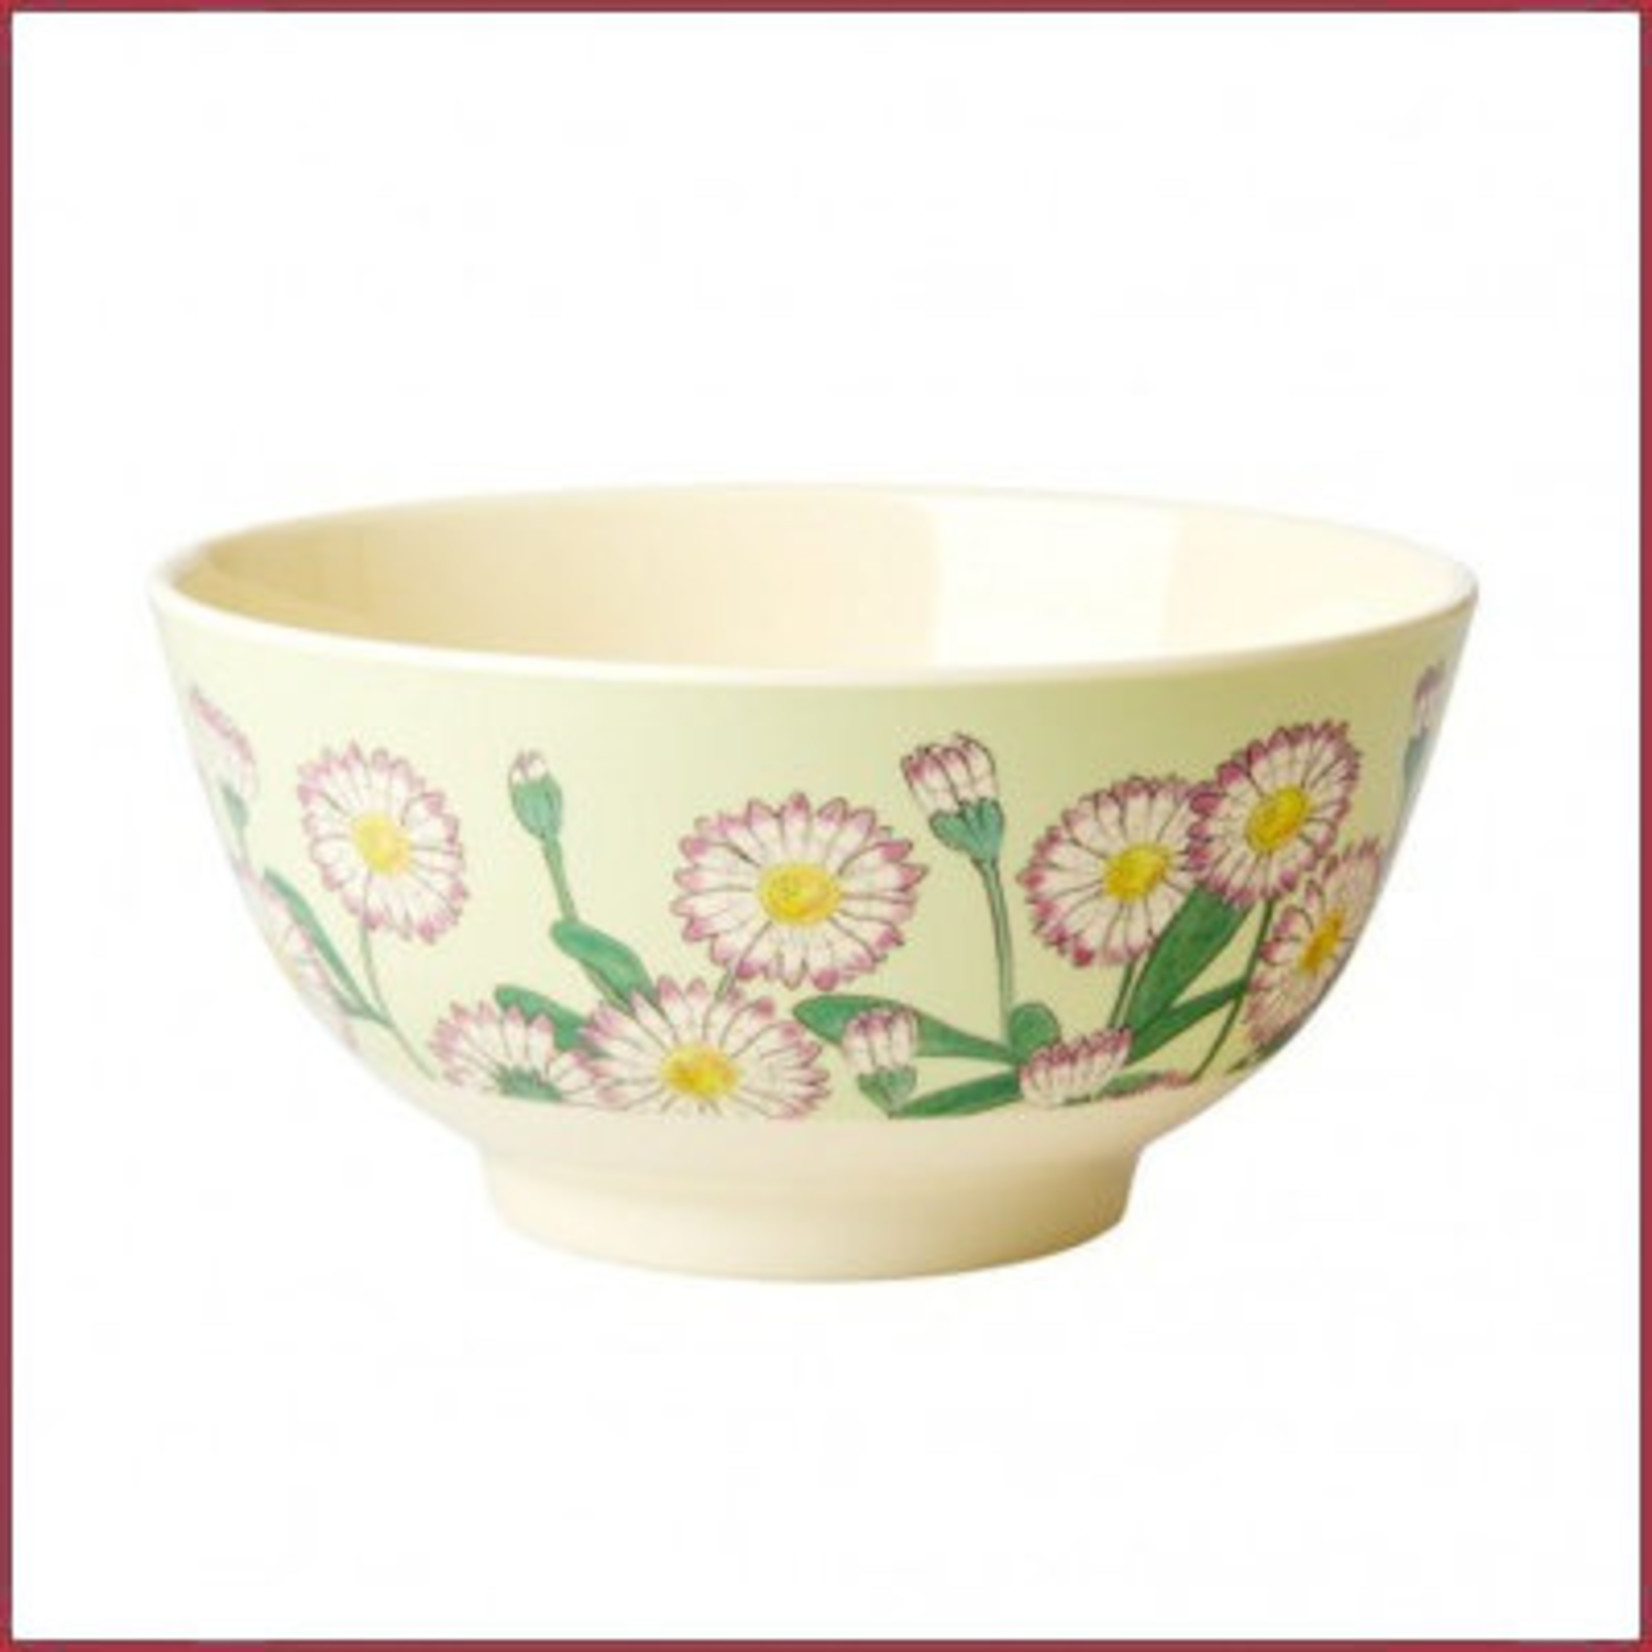 Rice Rice Bowl Medium - Daisy Print